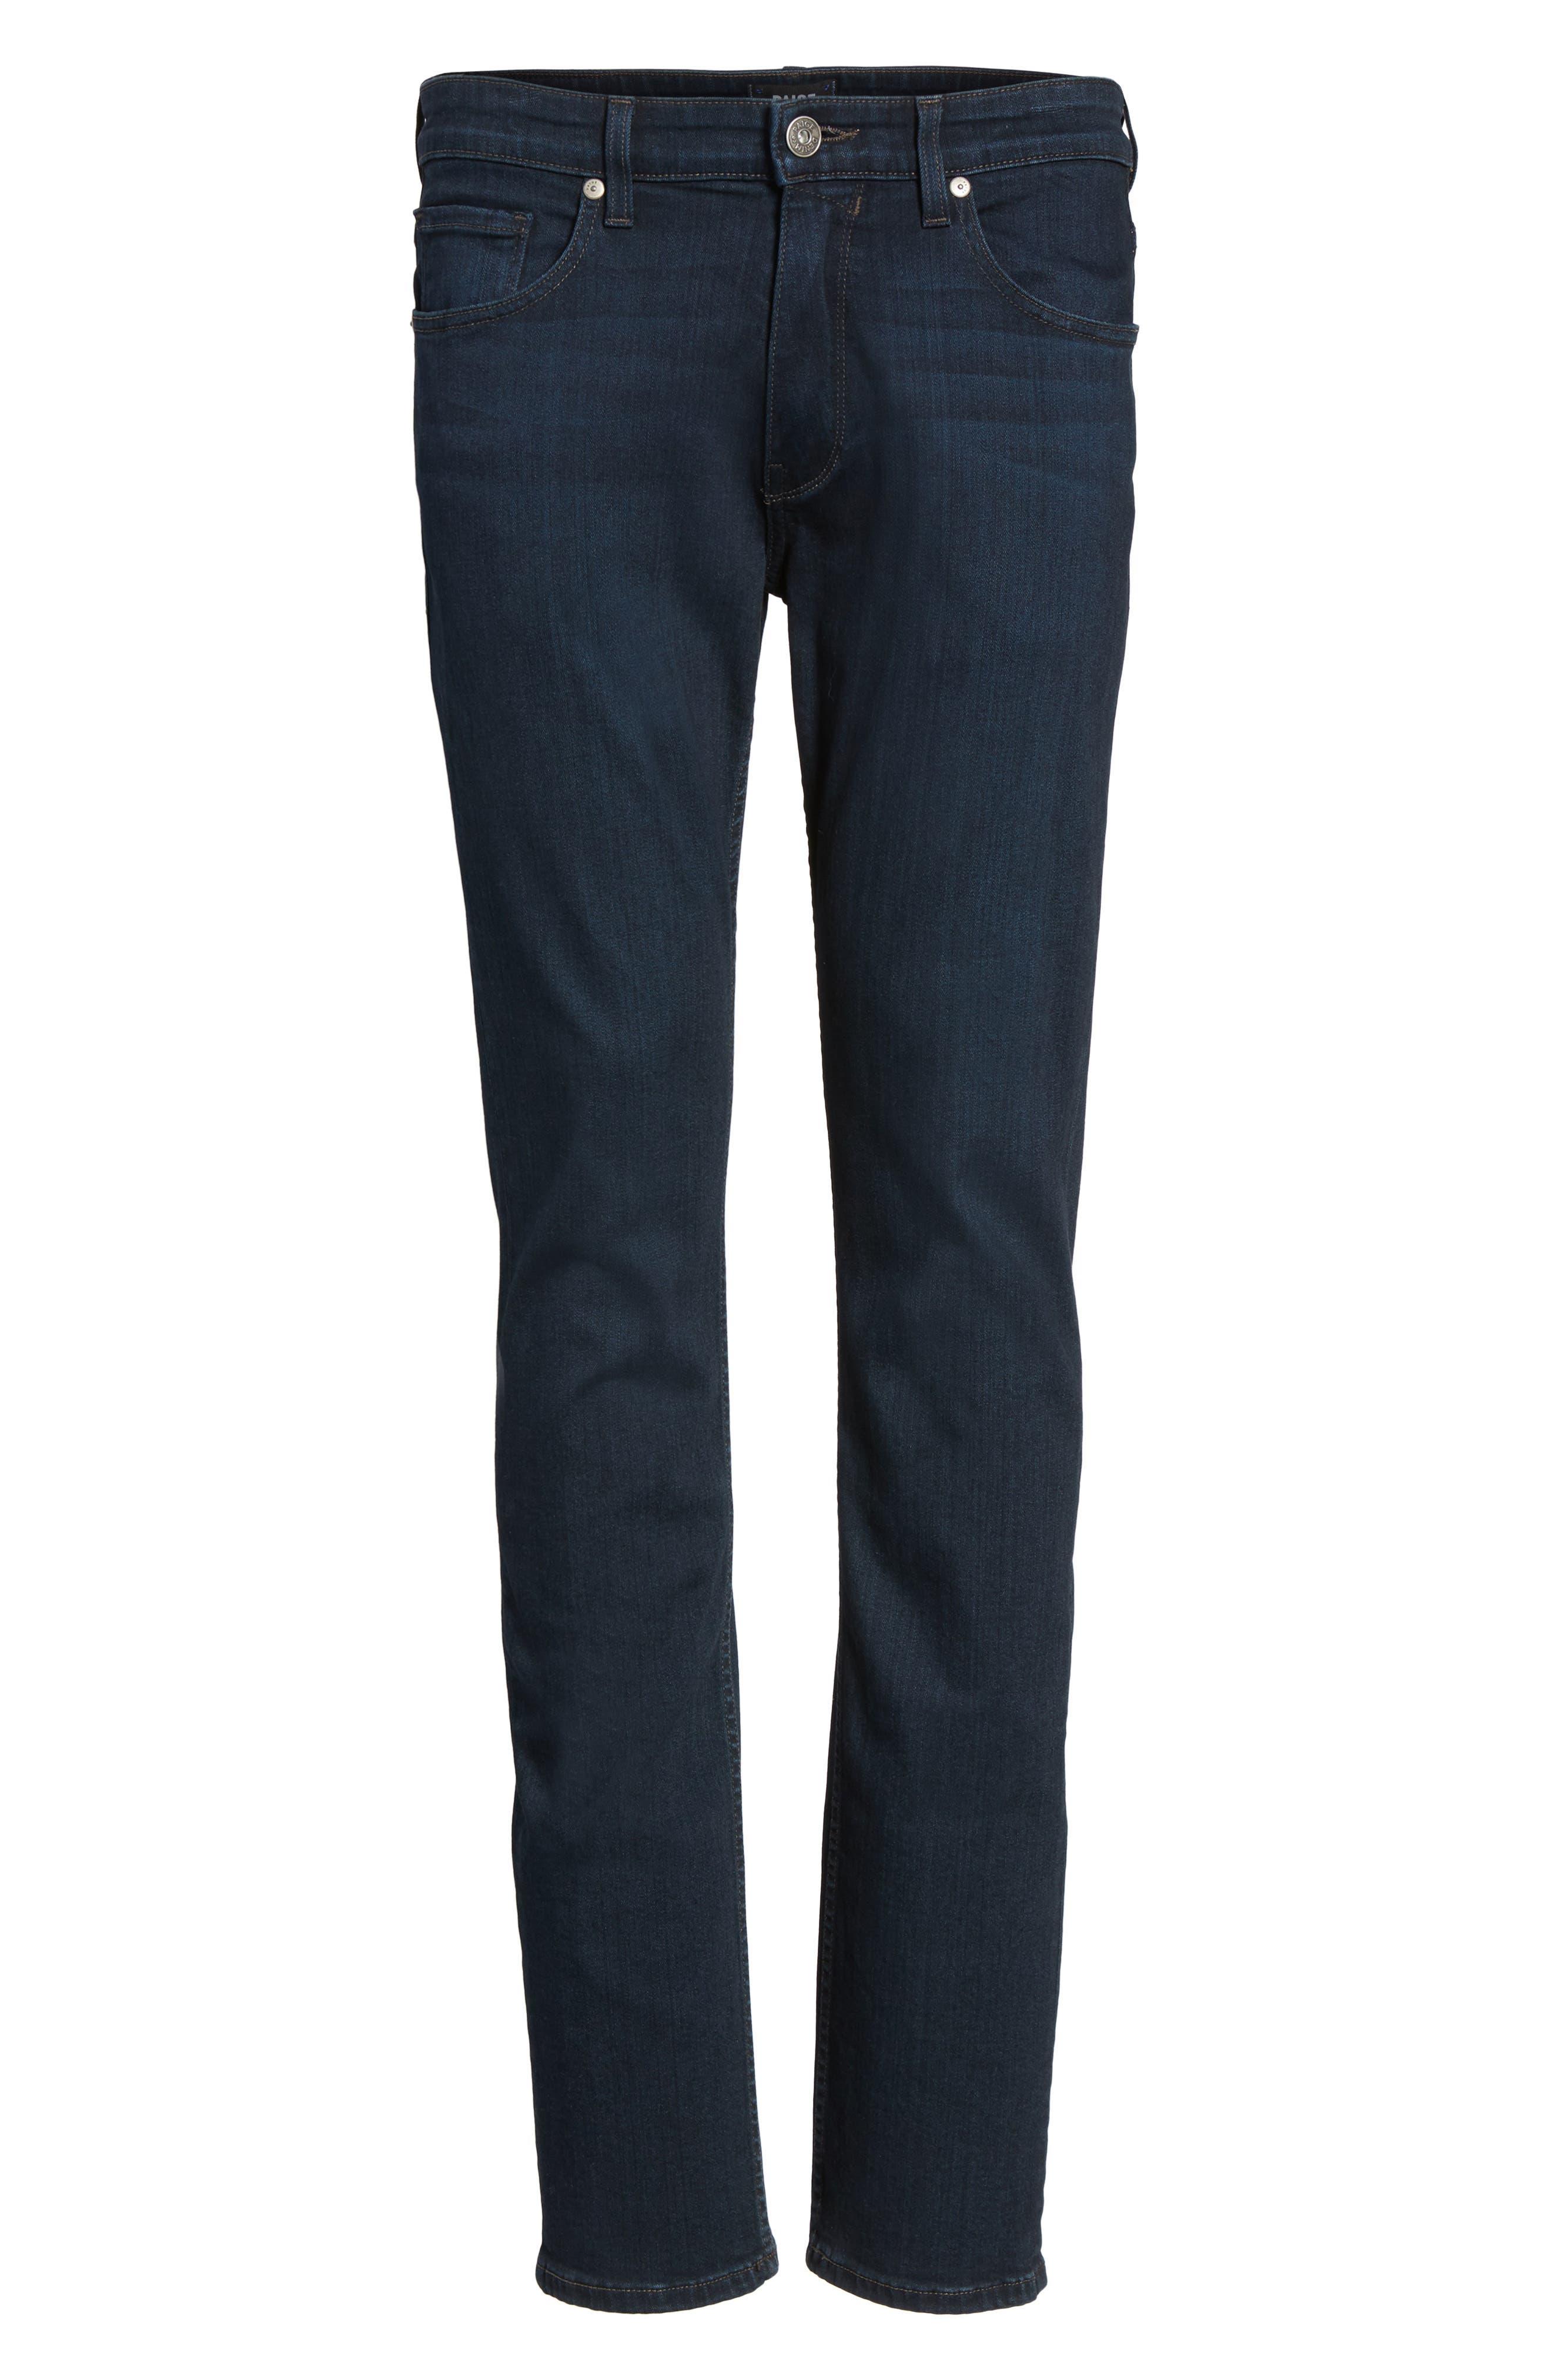 Normandie Straight Leg Jeans,                             Alternate thumbnail 6, color,                             ARLO